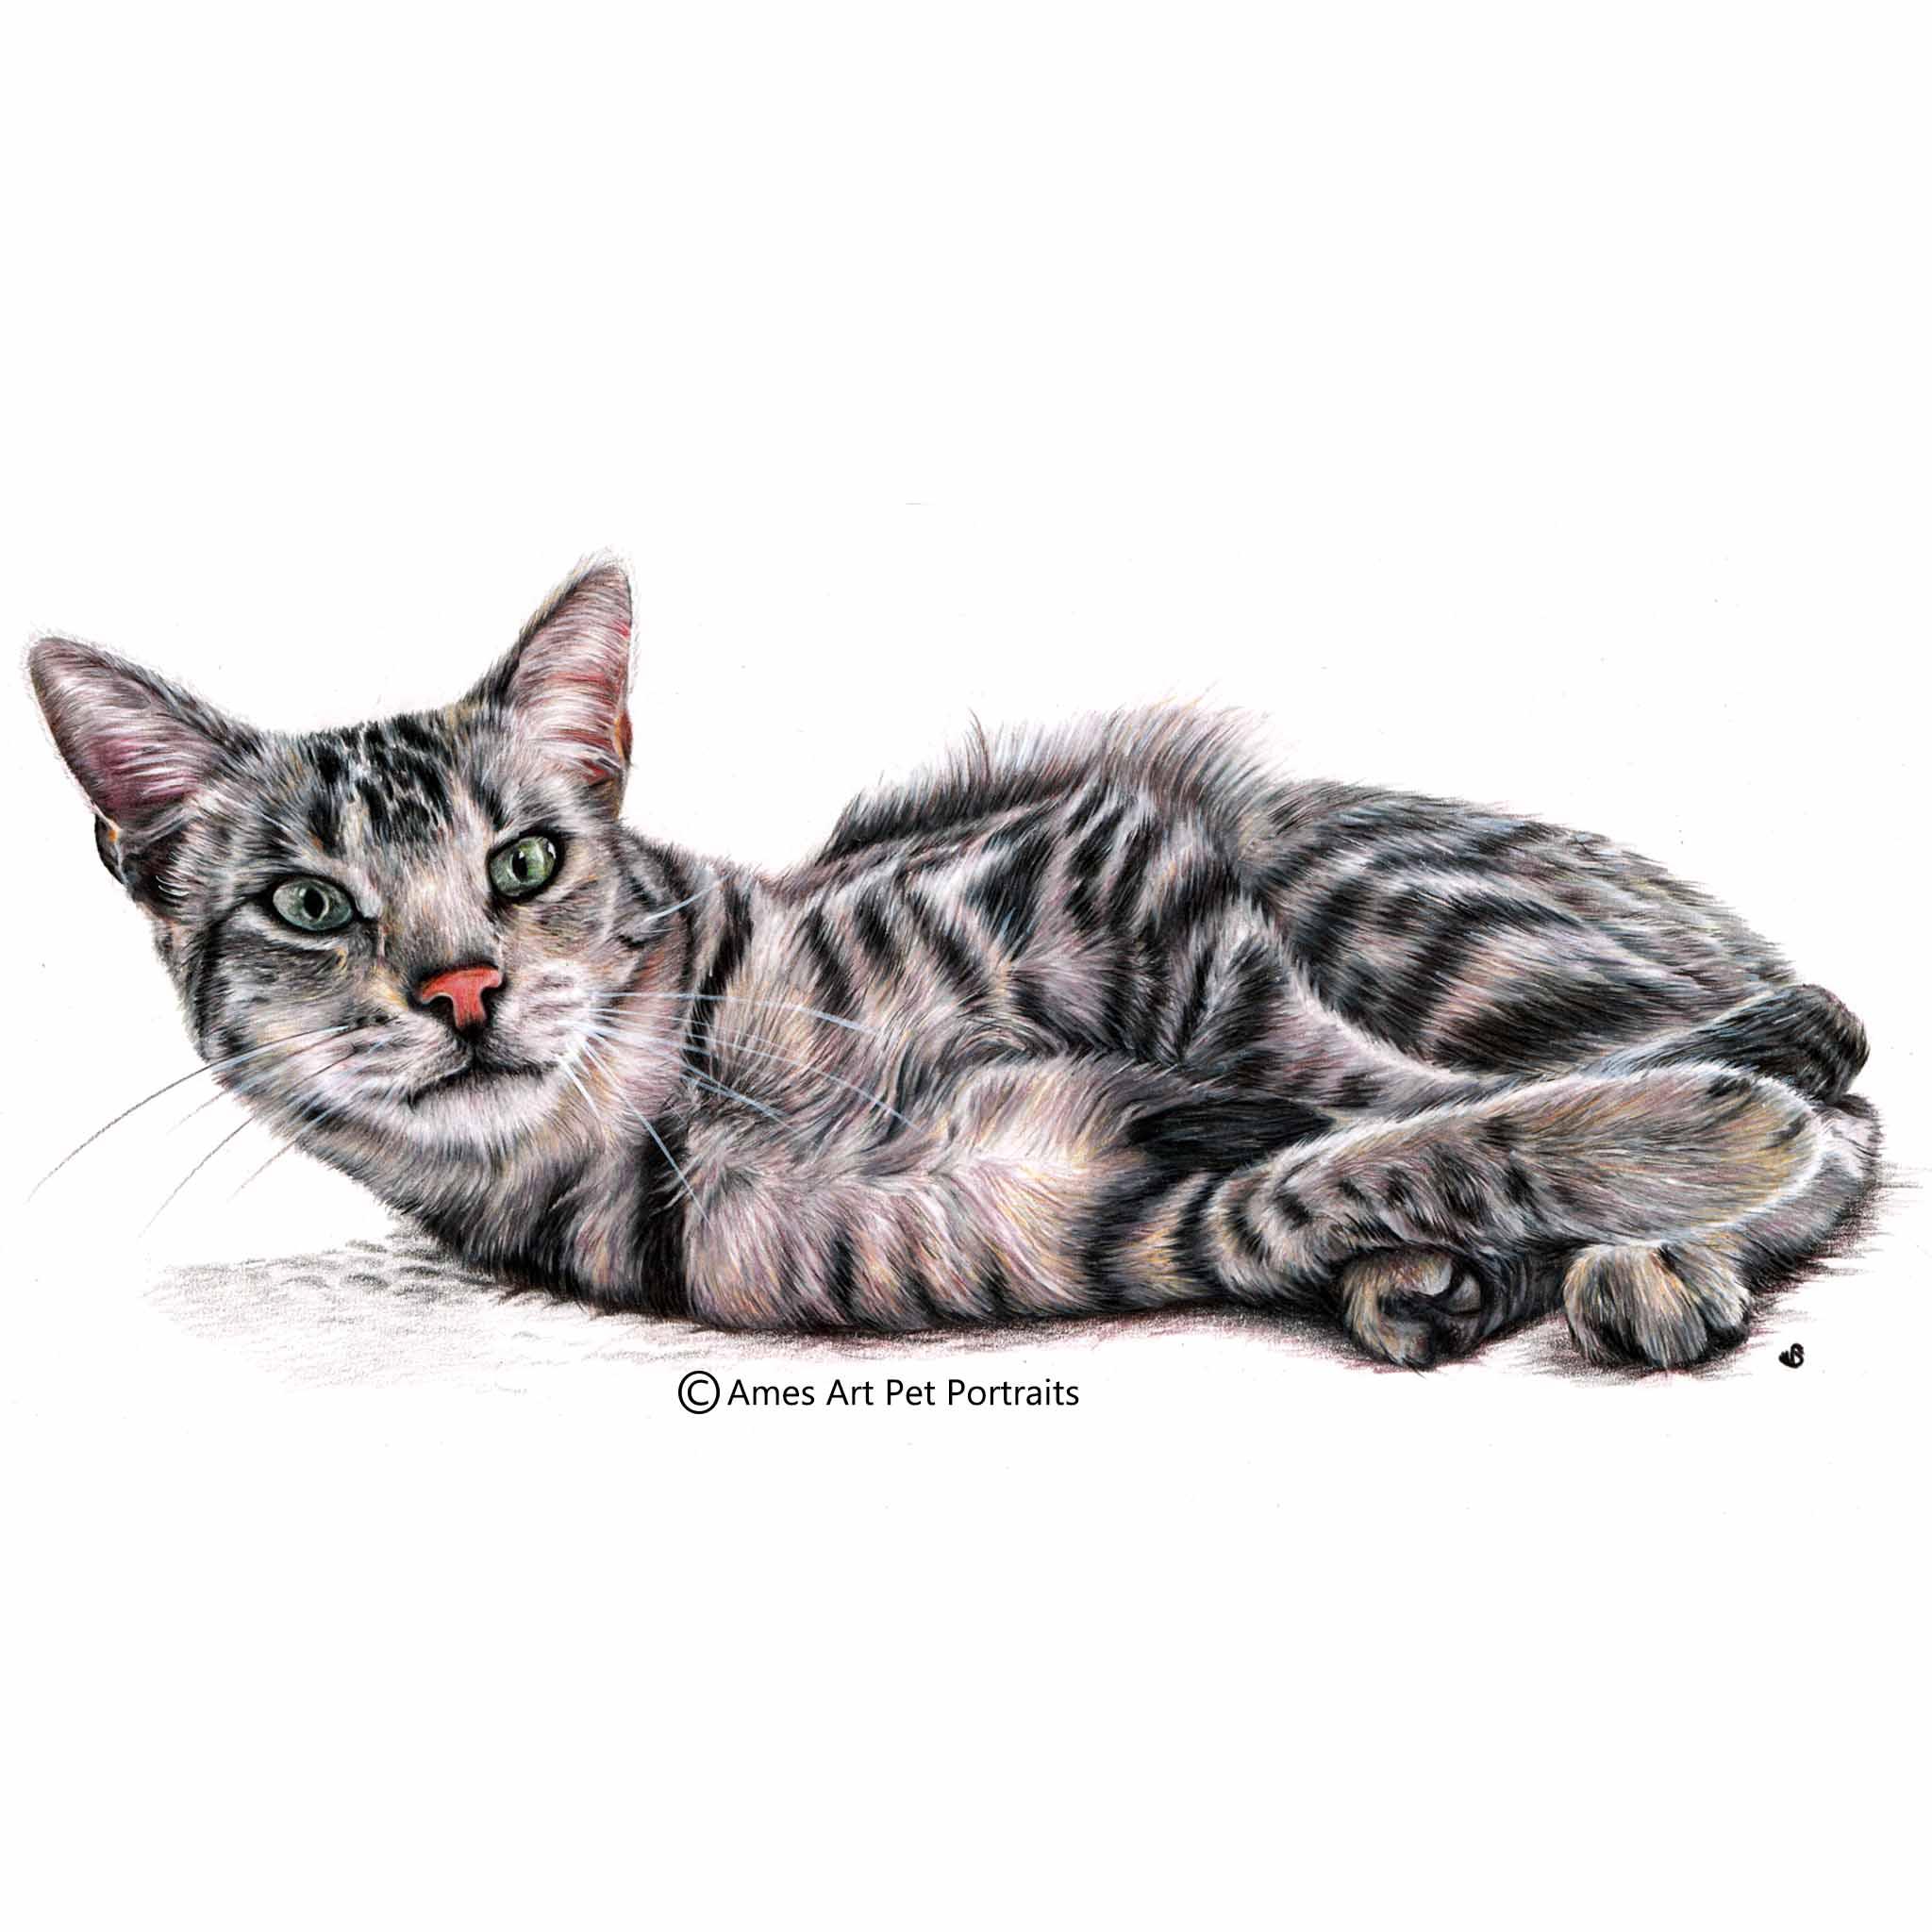 'Jarhar' - USA, 16.5 x 11.7 inches, 2017, Color Pencil Cat Portrait